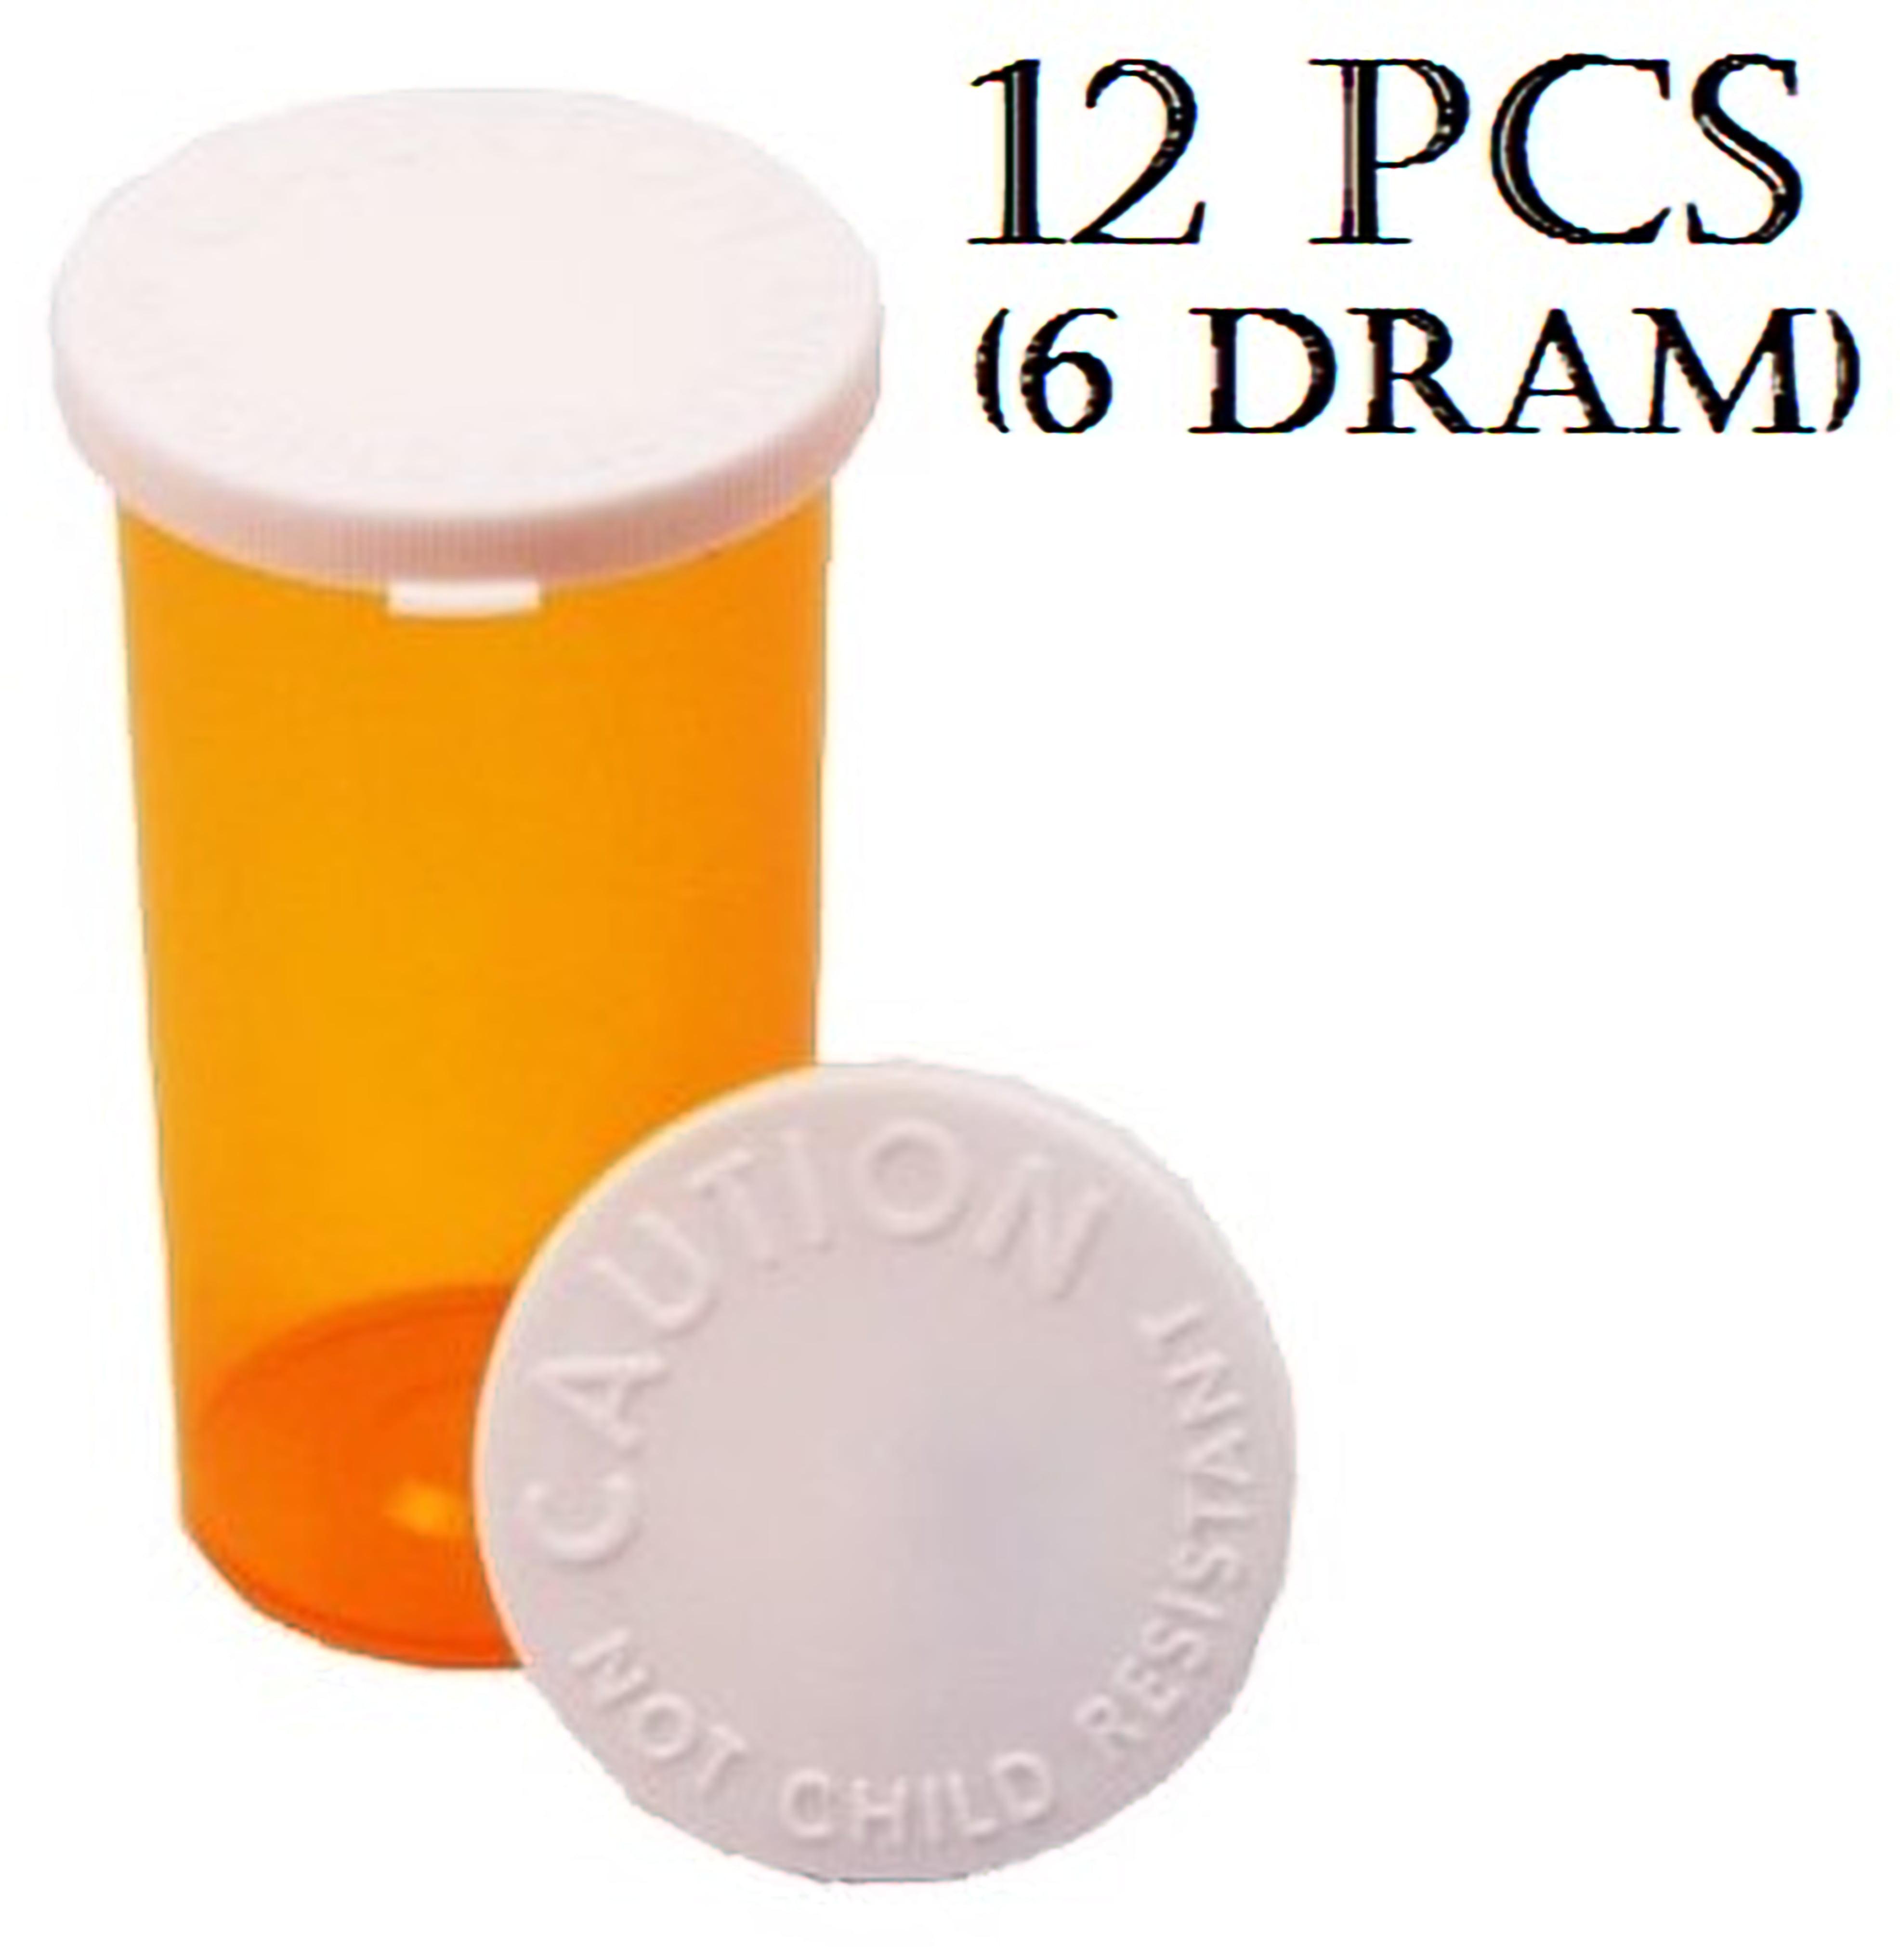 BioRx Sponix Pharmacy Vials - Snap Caps - 6 Dram - Amber - 12 pcs (Prescription Vial, Medicine Container, Pill Container)